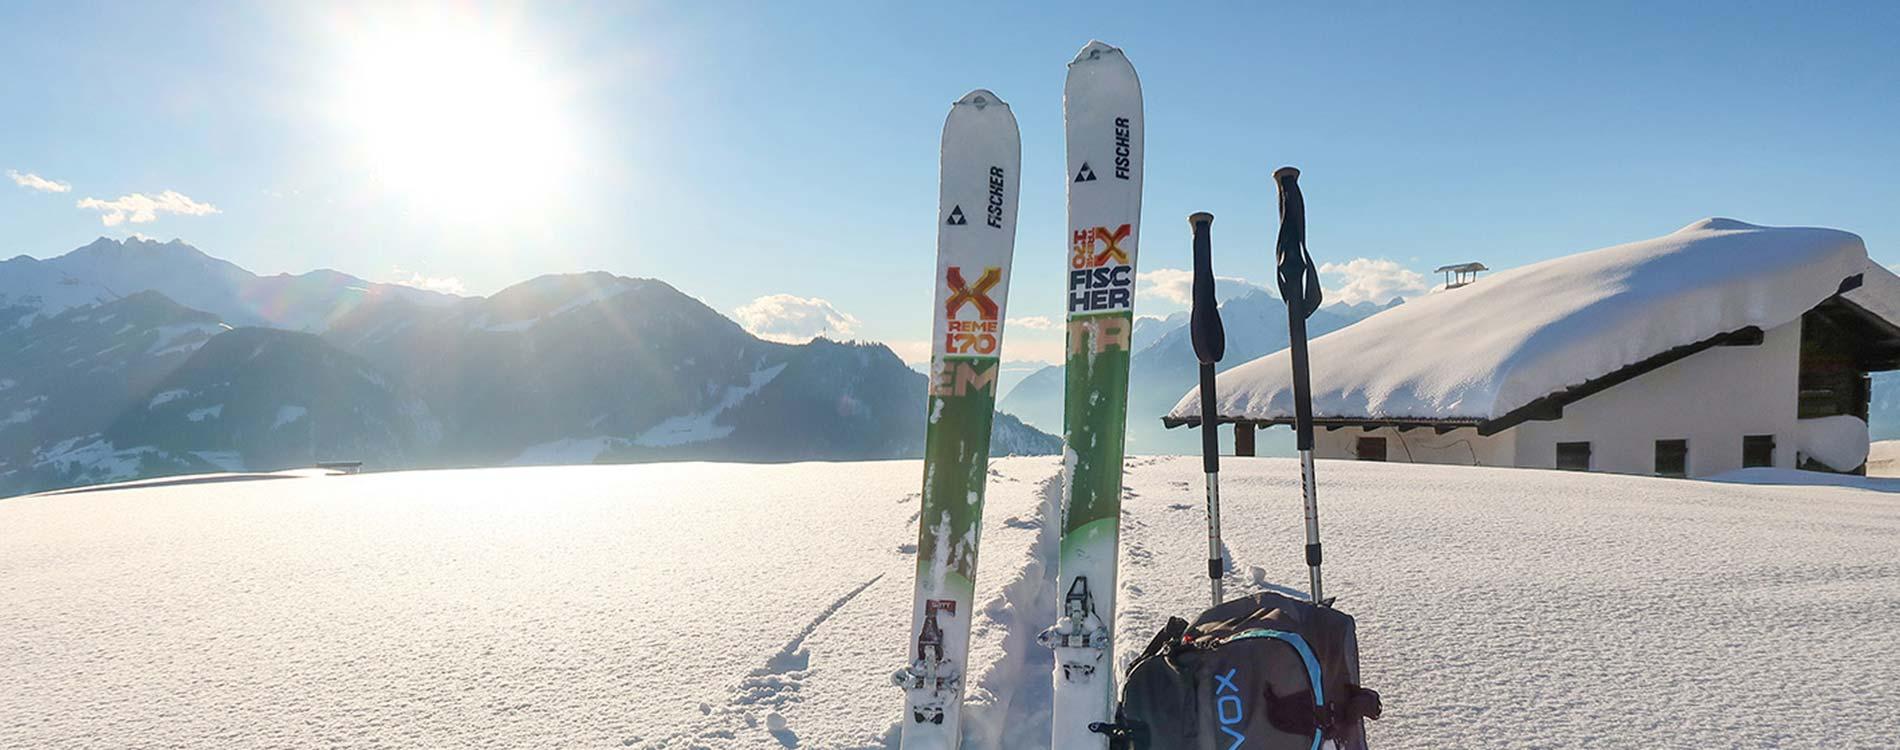 Ski Jewel Alpbachtal Seenland Tyrol Austria